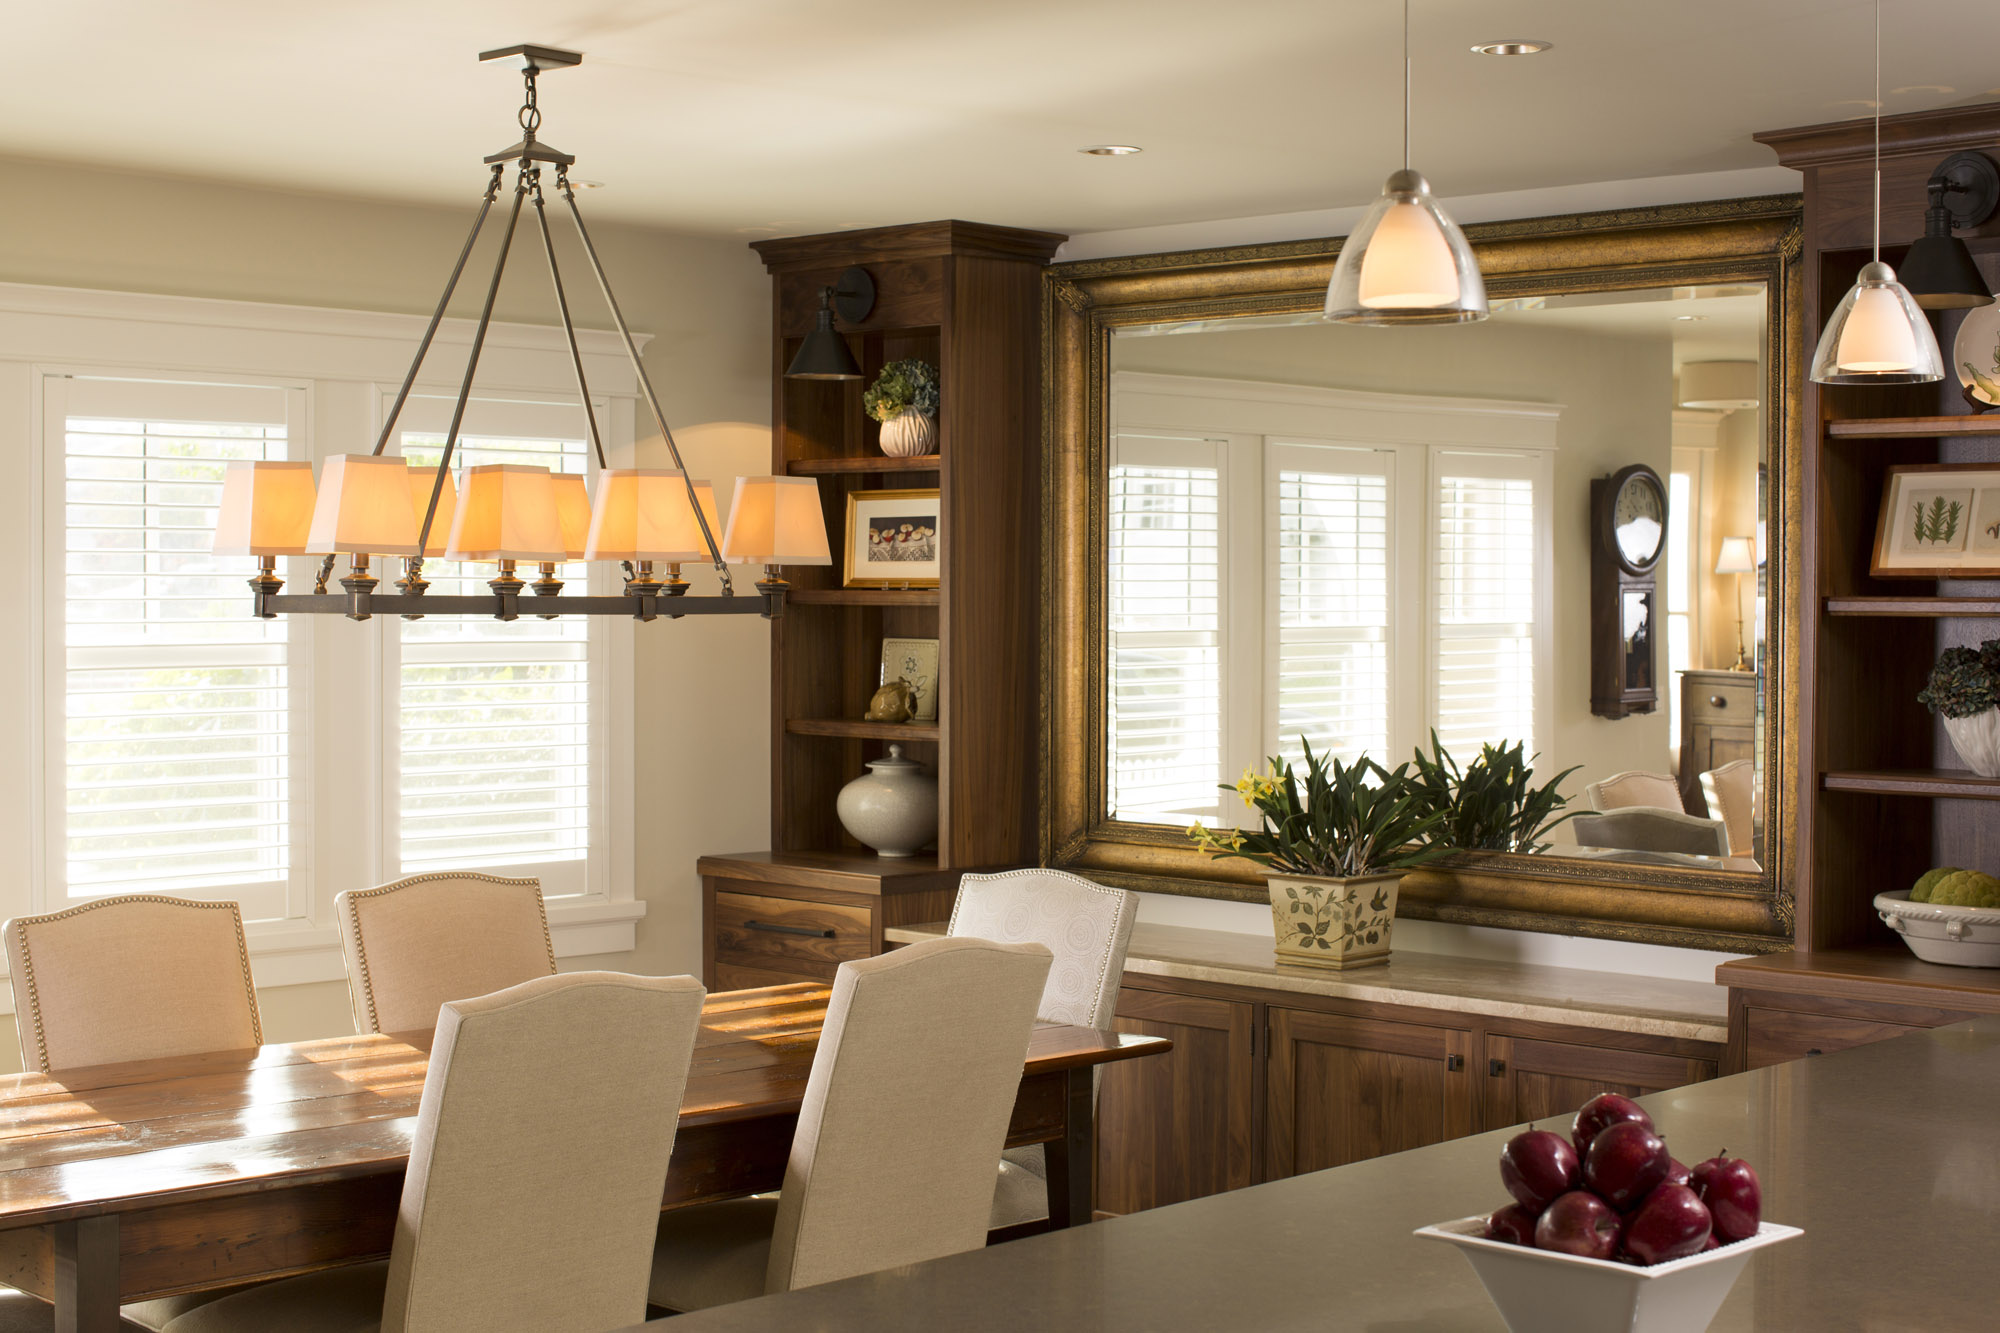 3C2_diningroom-8605.jpg